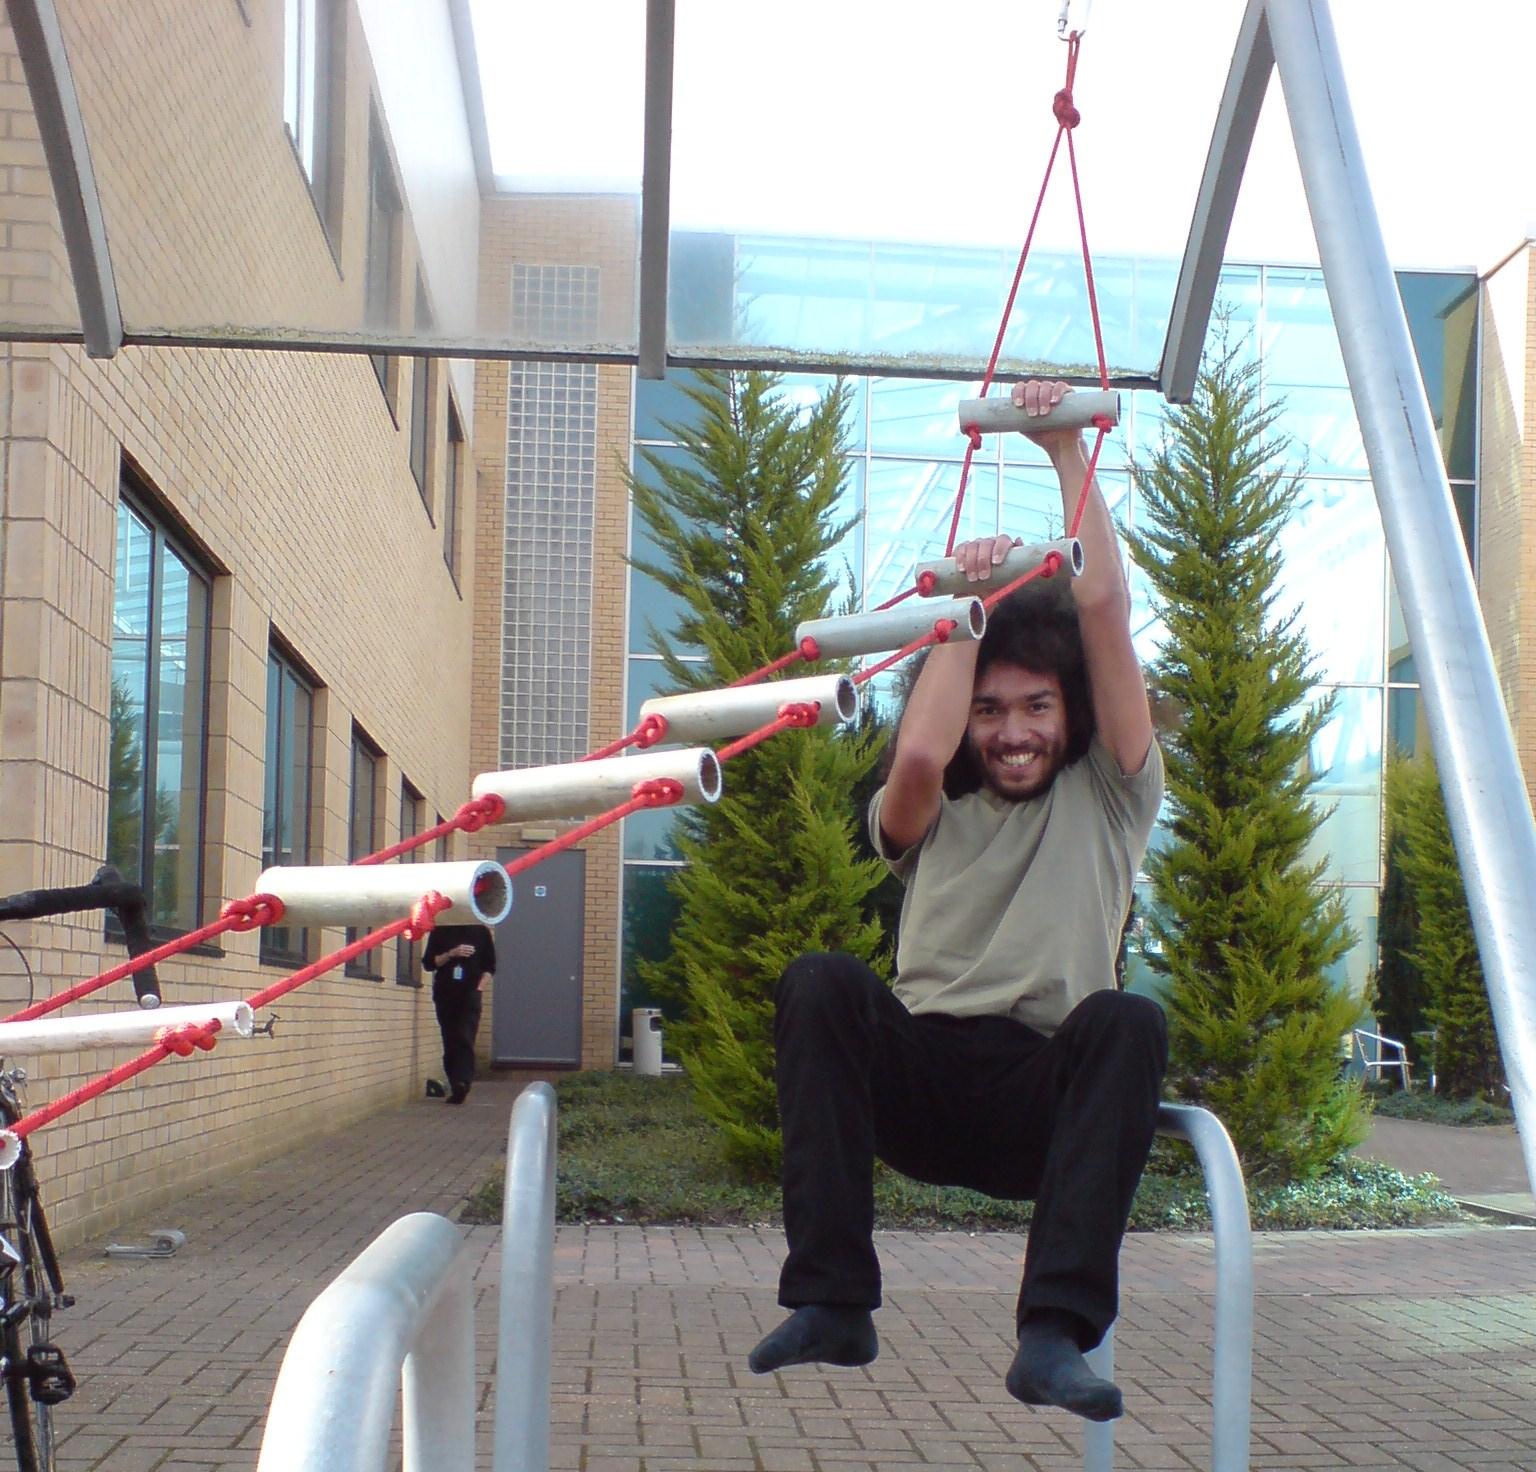 Bachar ladder - Wikipedia